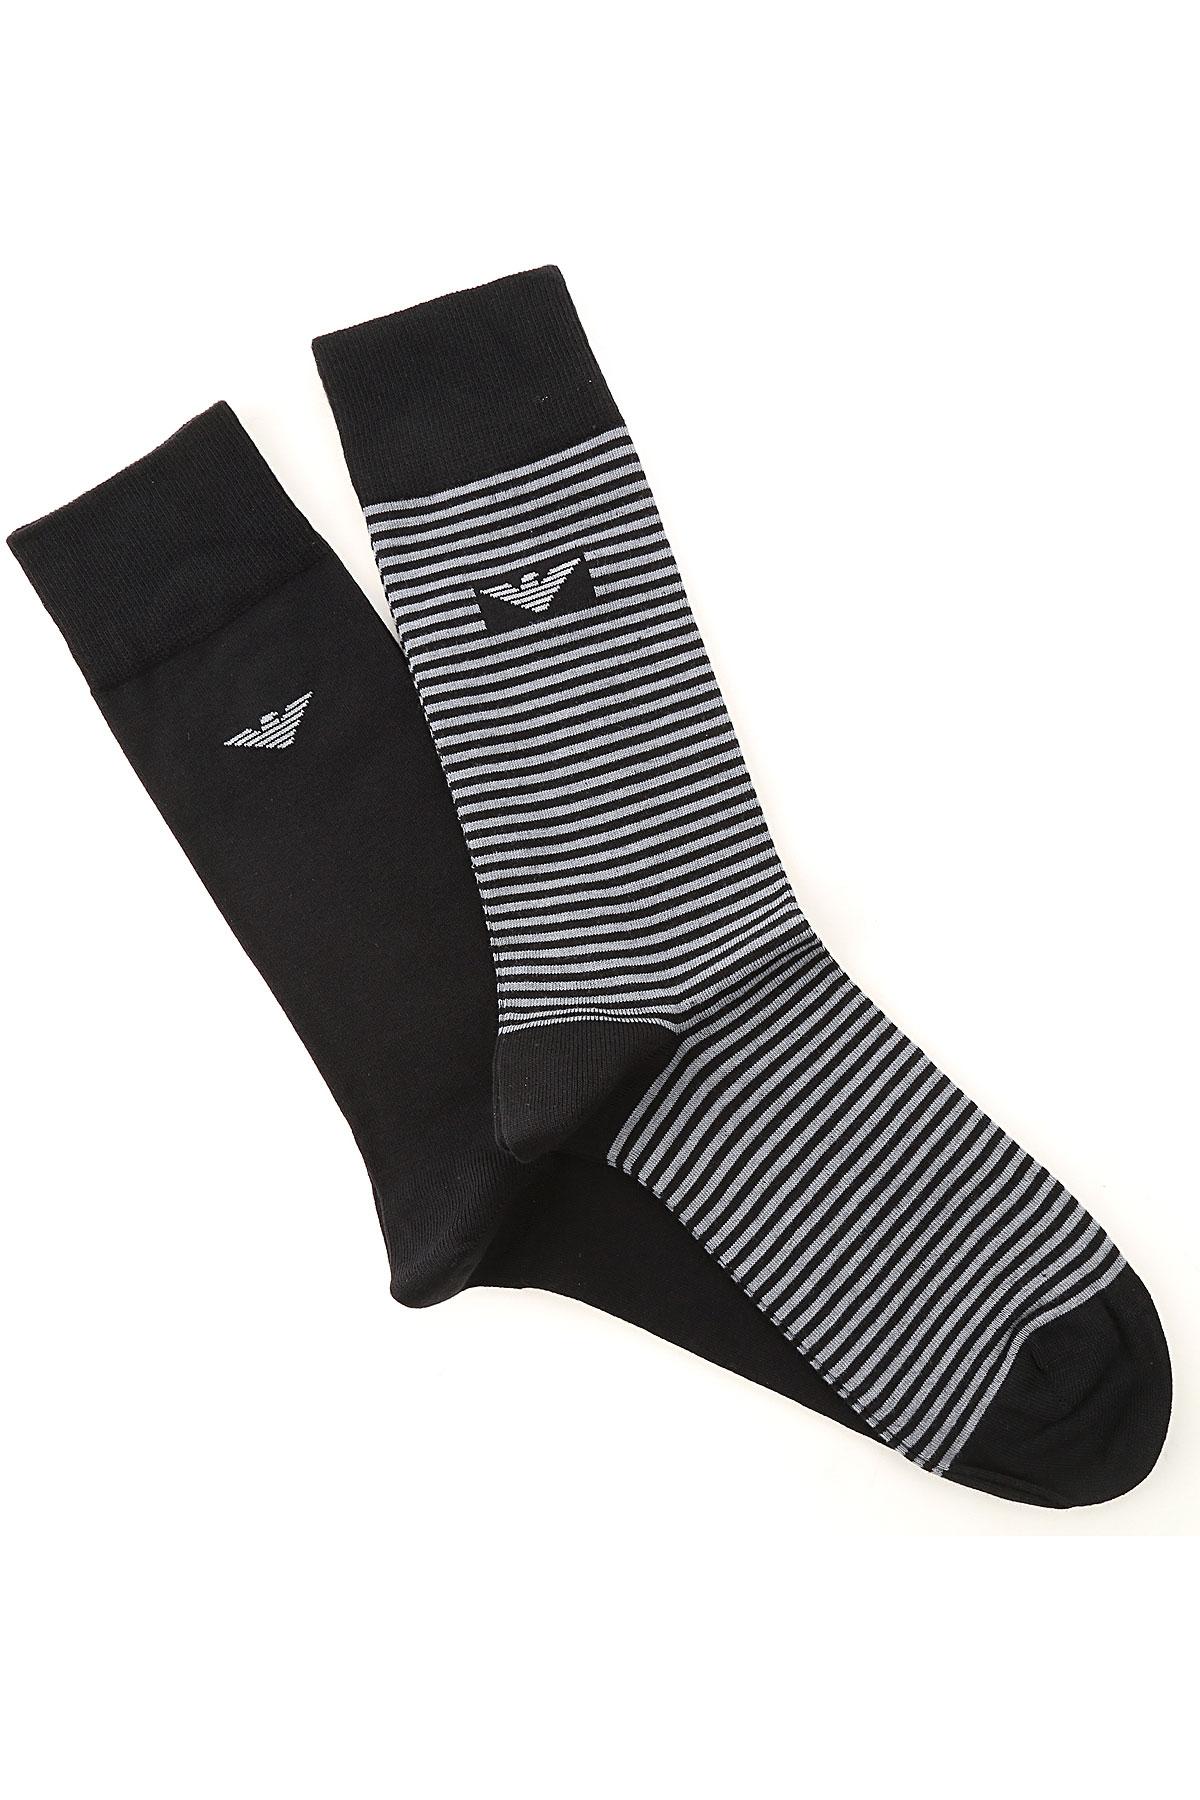 Emporio Armani Socks Socks for Men On Sale, 2 Pack, Black, Organic Cotton, 2019